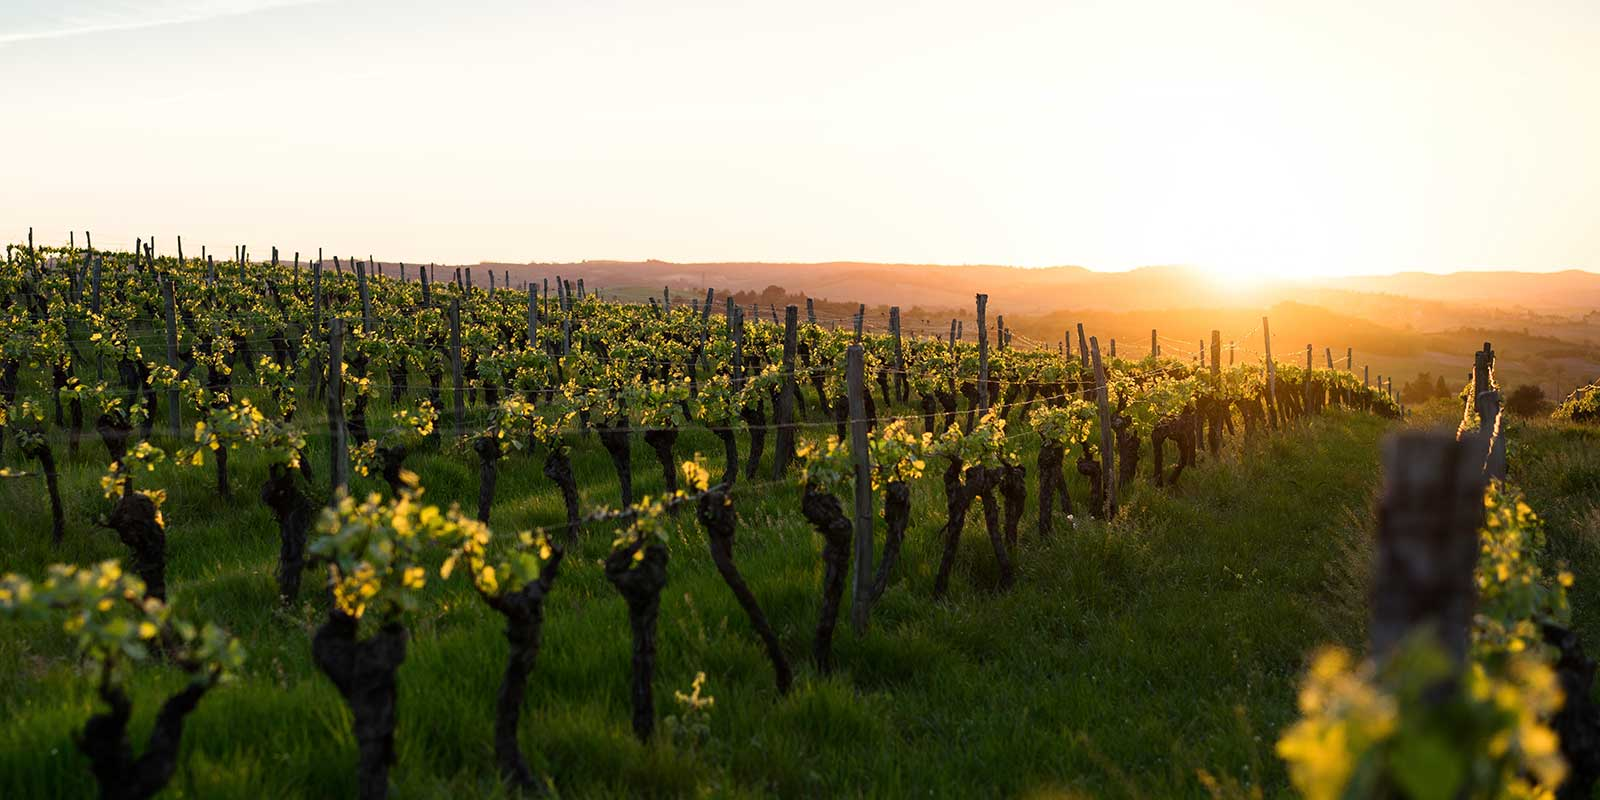 b-boer-vineyards